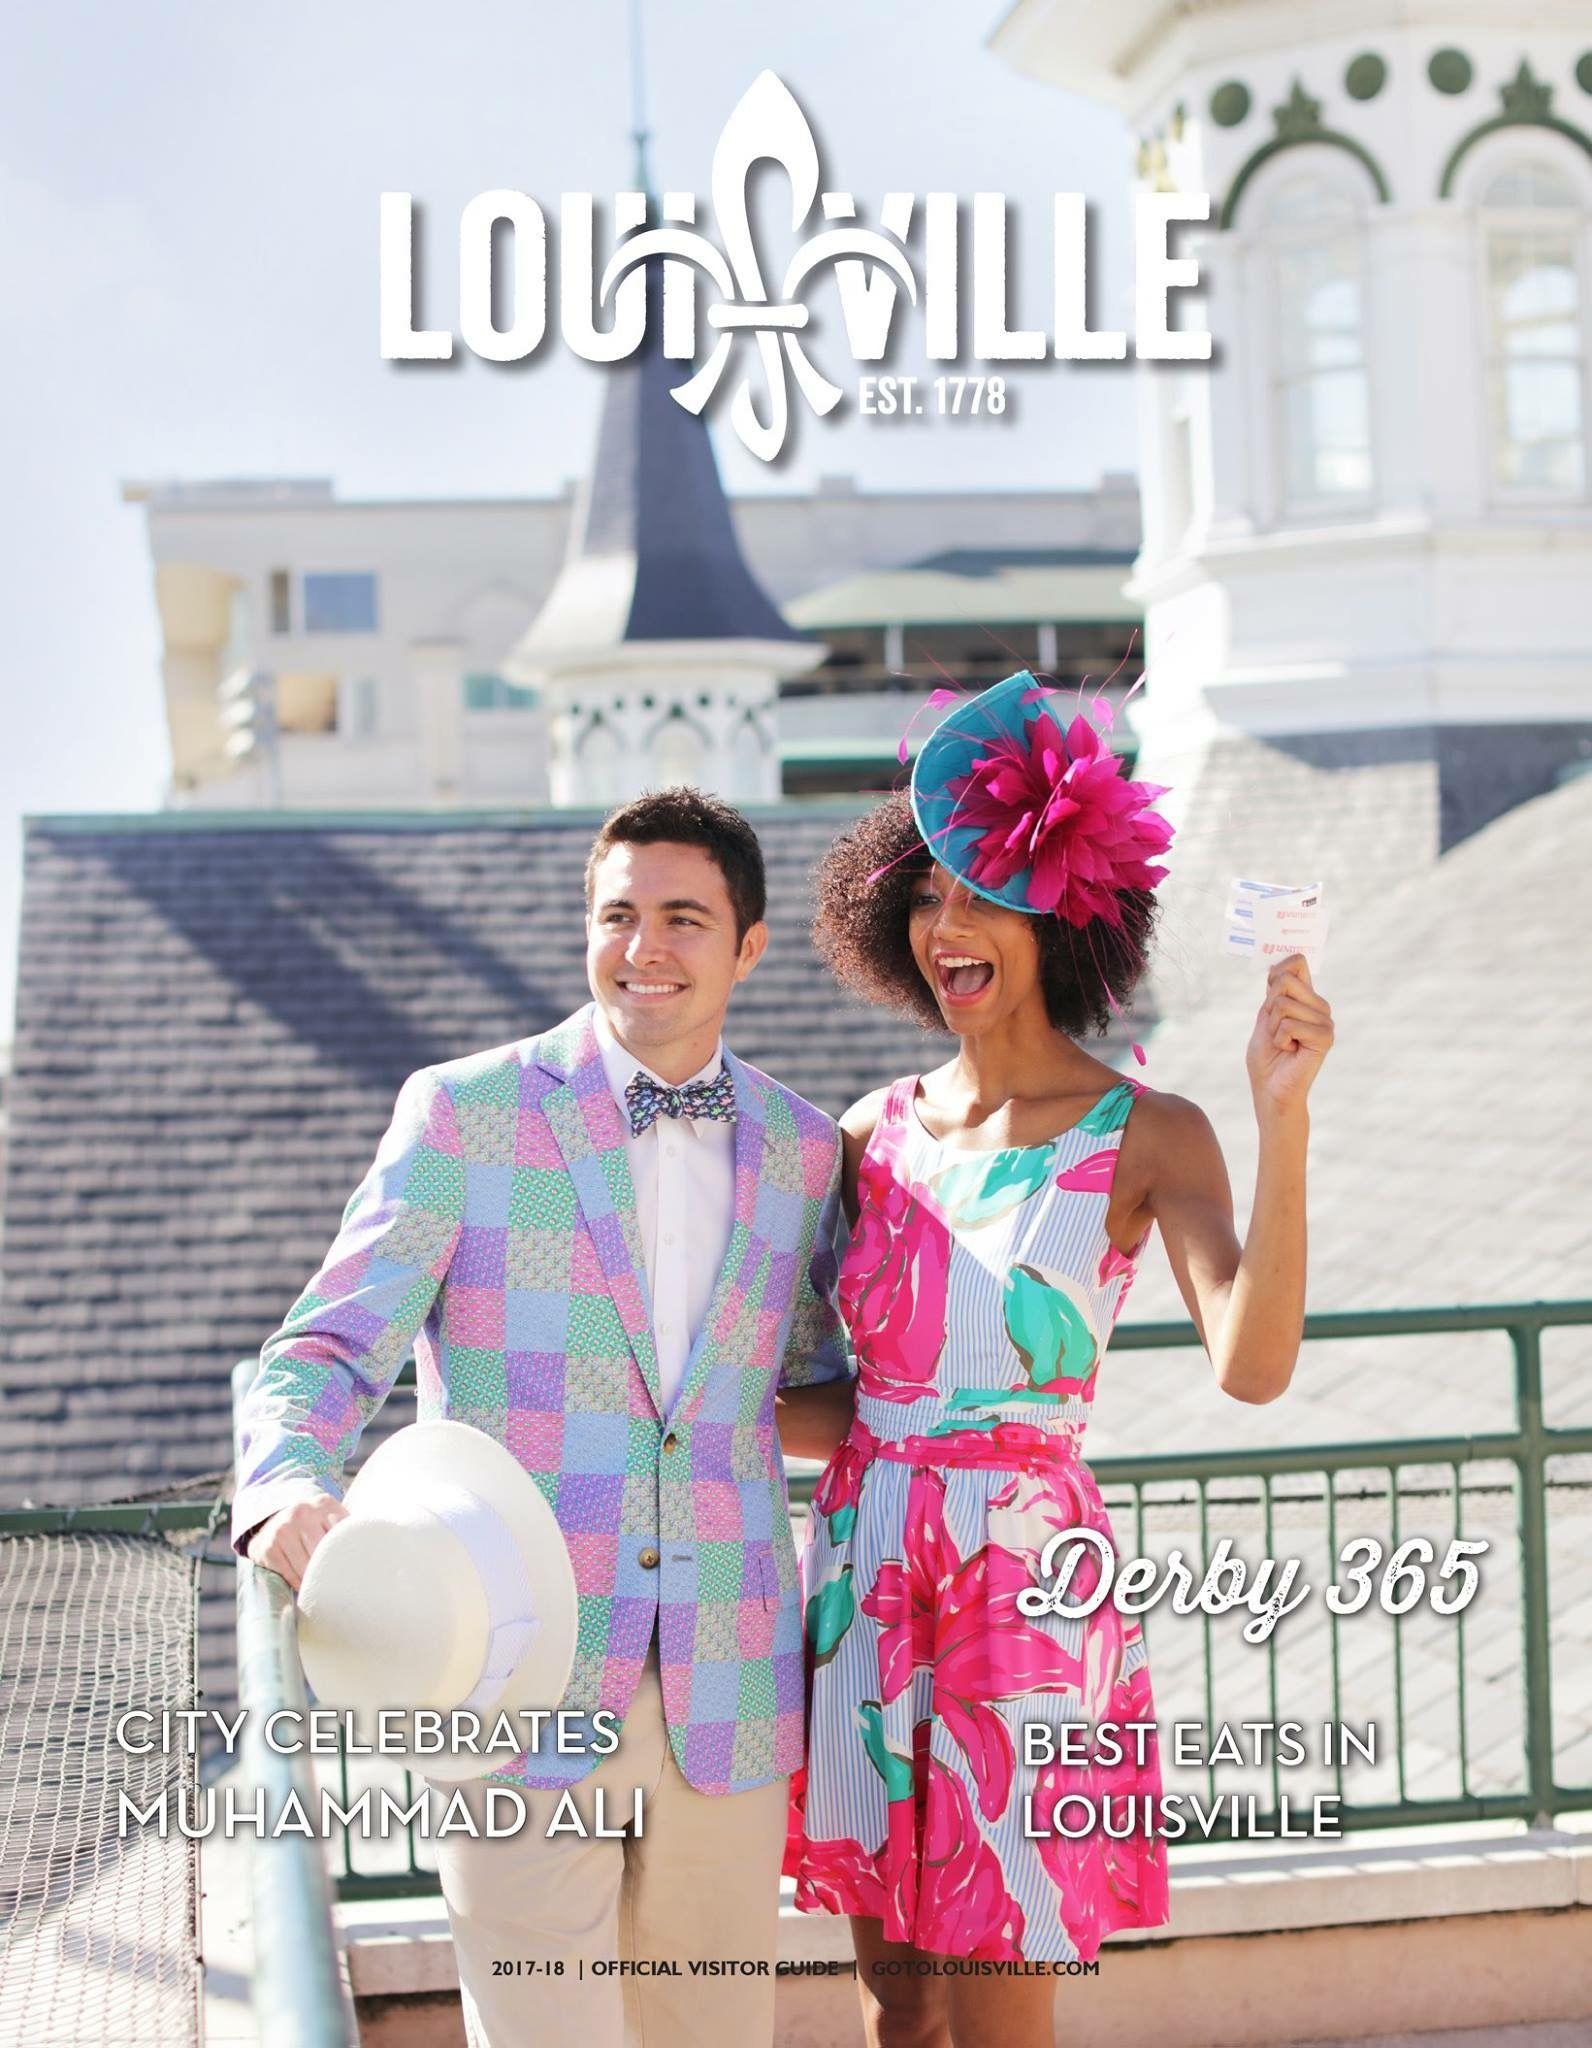 Louisville Events Calendar.Pin By Debbie Tallarico On Hats Derby Derby Event Calendar Kentucky